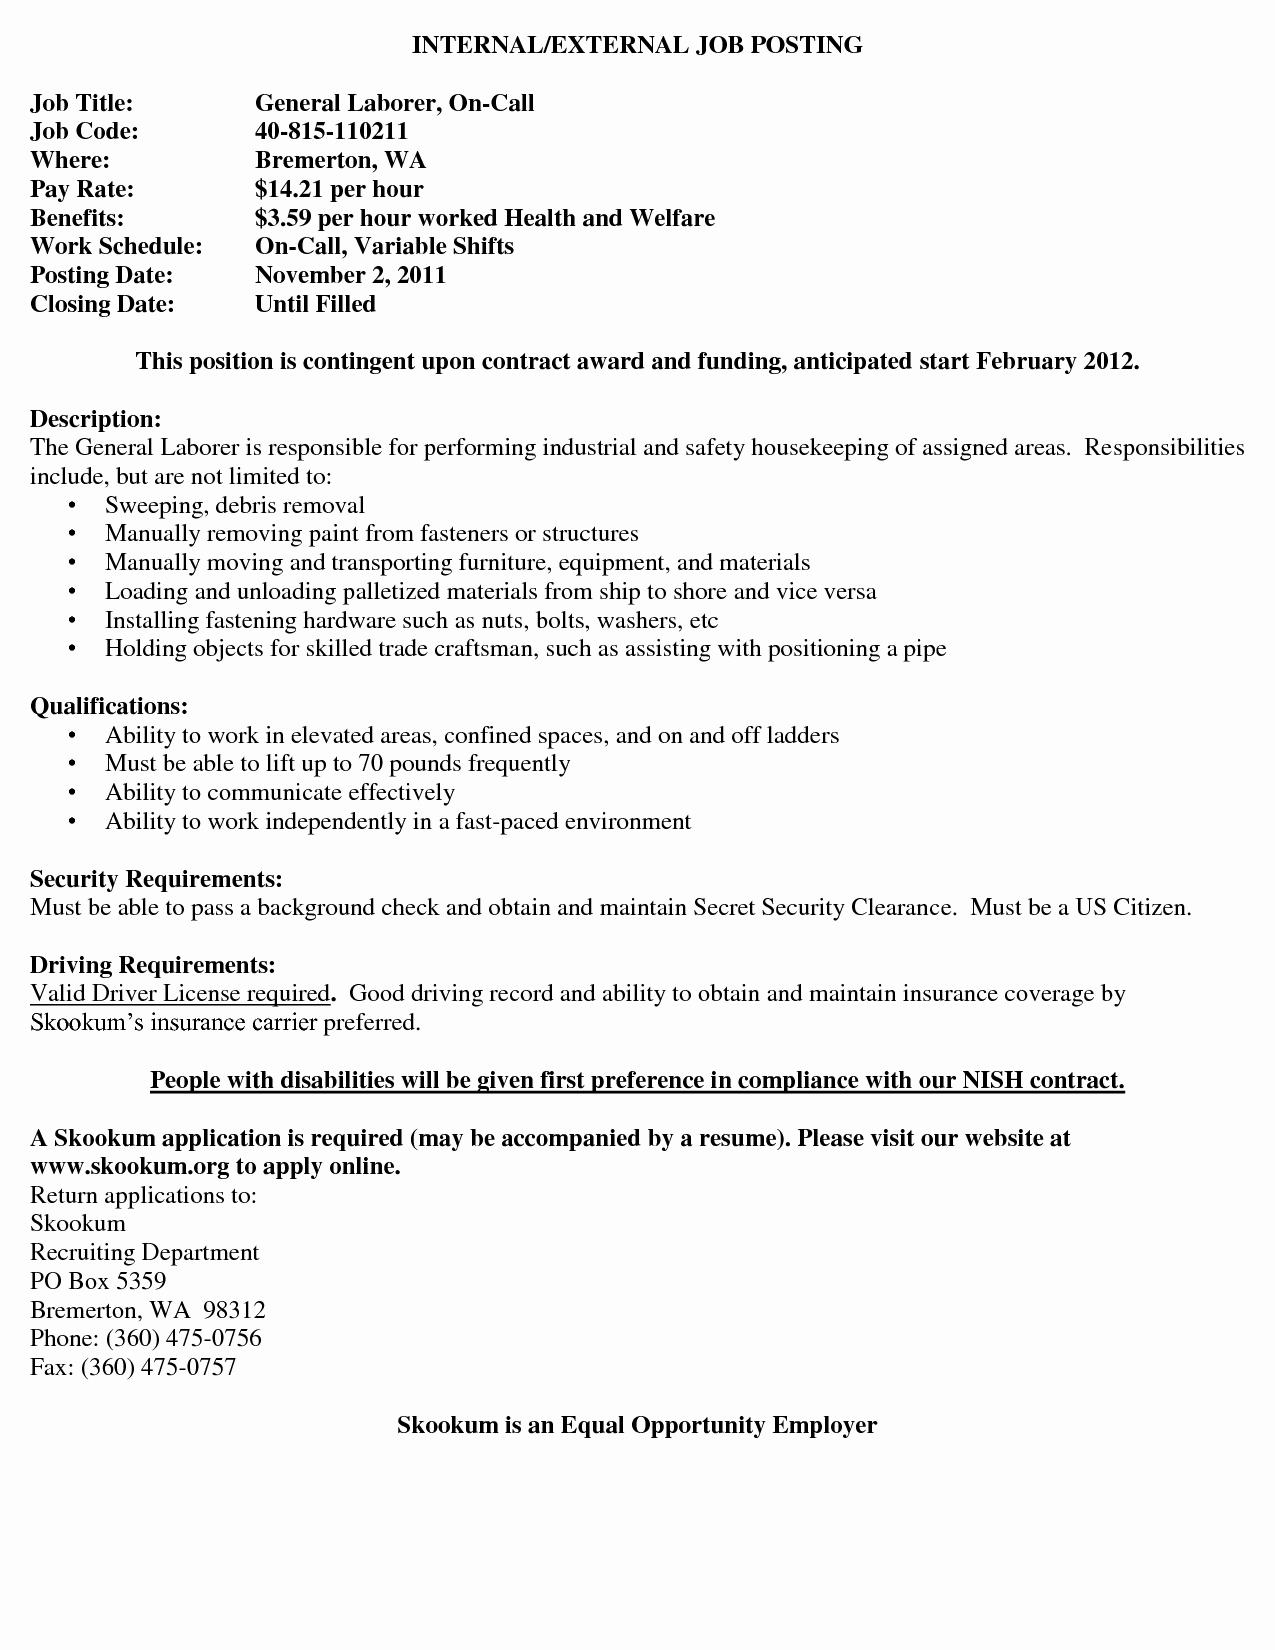 General Resume Summary Example